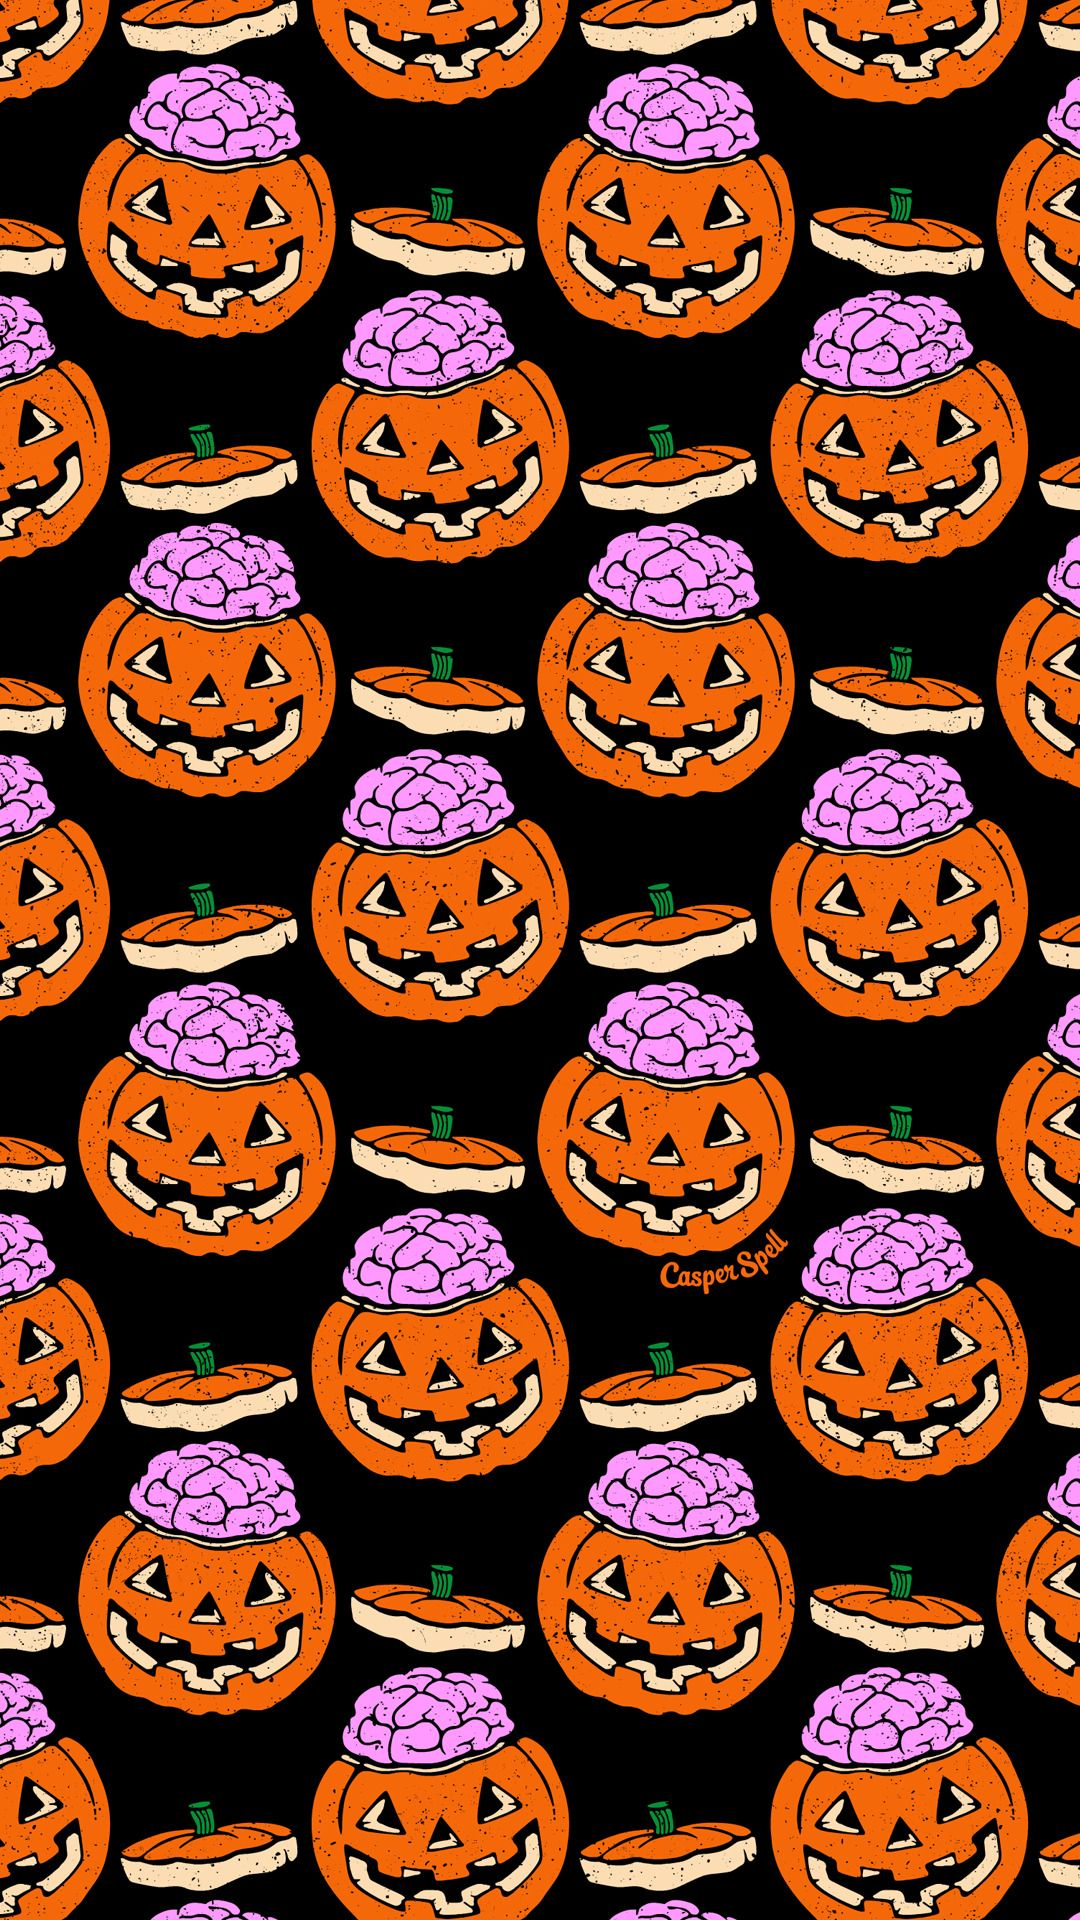 42 Halloween 2019 Wallpapers On Wallpapersafari